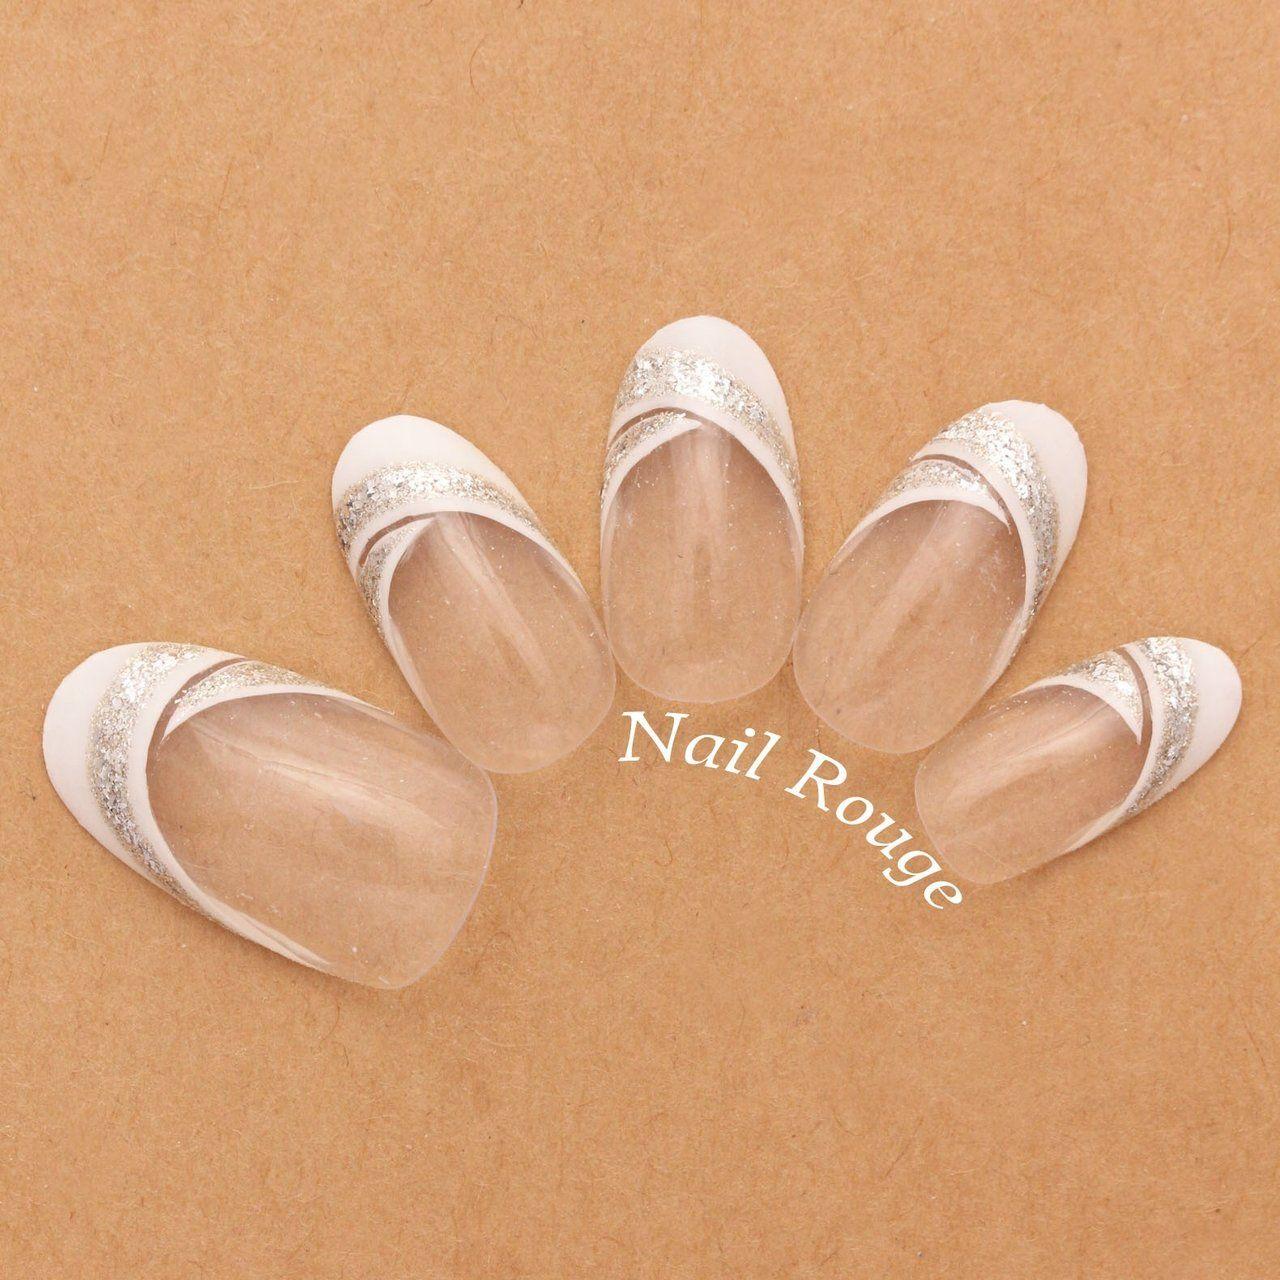 nailrougeのネイルデザイン[No 3057141]|ネイルブック is part of nails -     ネイルデザインを探すならネイル数No 1のネイルブック